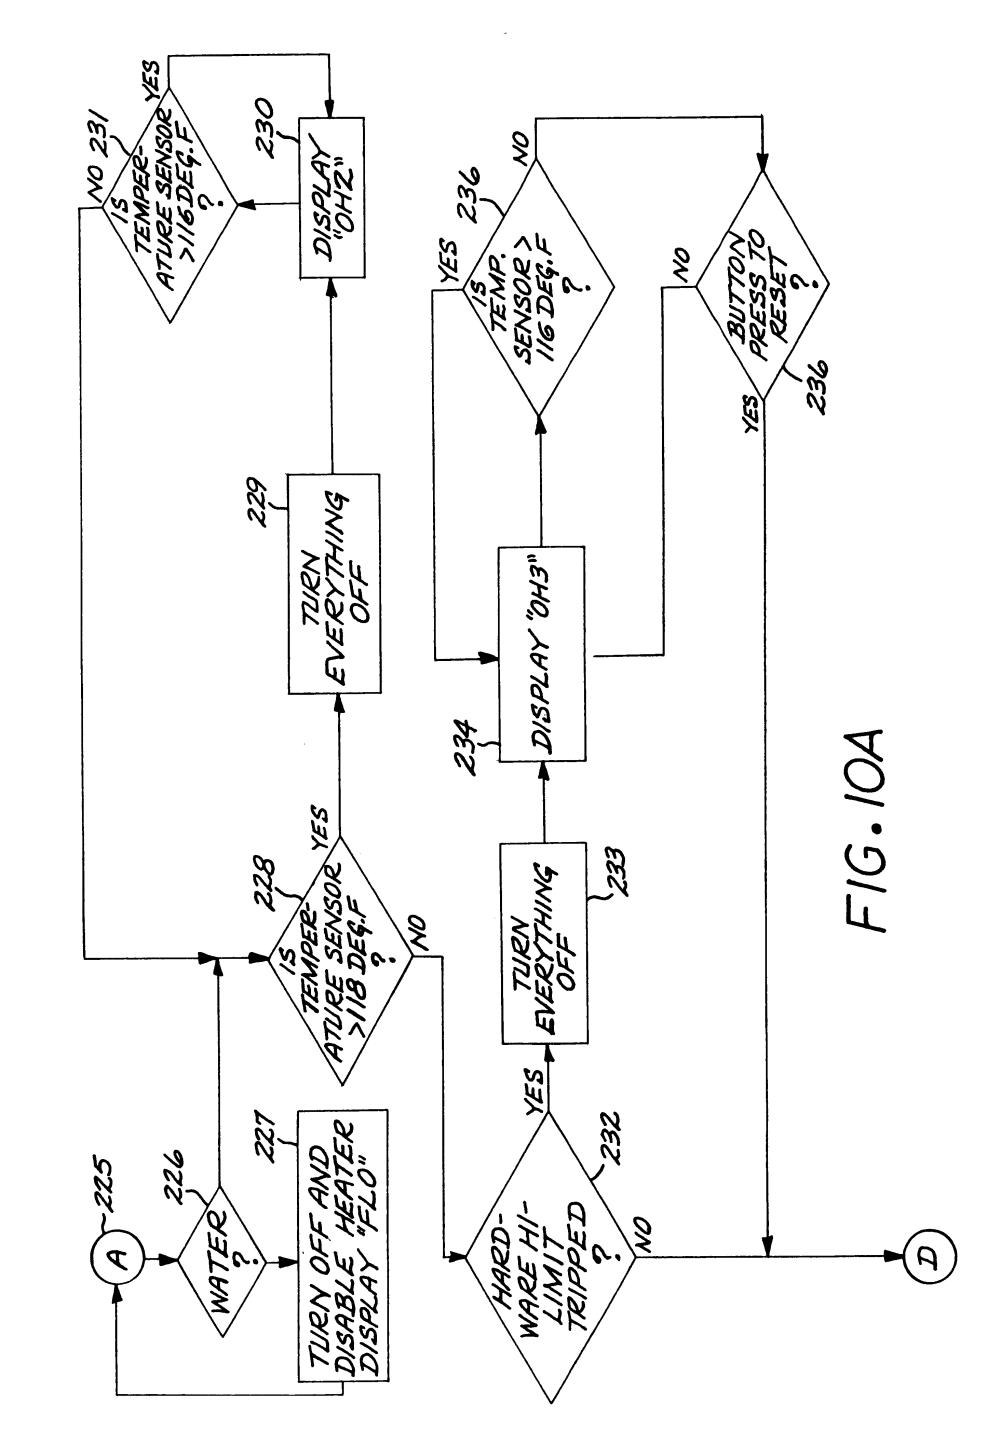 medium resolution of 240v gfci breaker wiring diagram wiring diagrams free download auto wiring diagrams free download automotive wiring